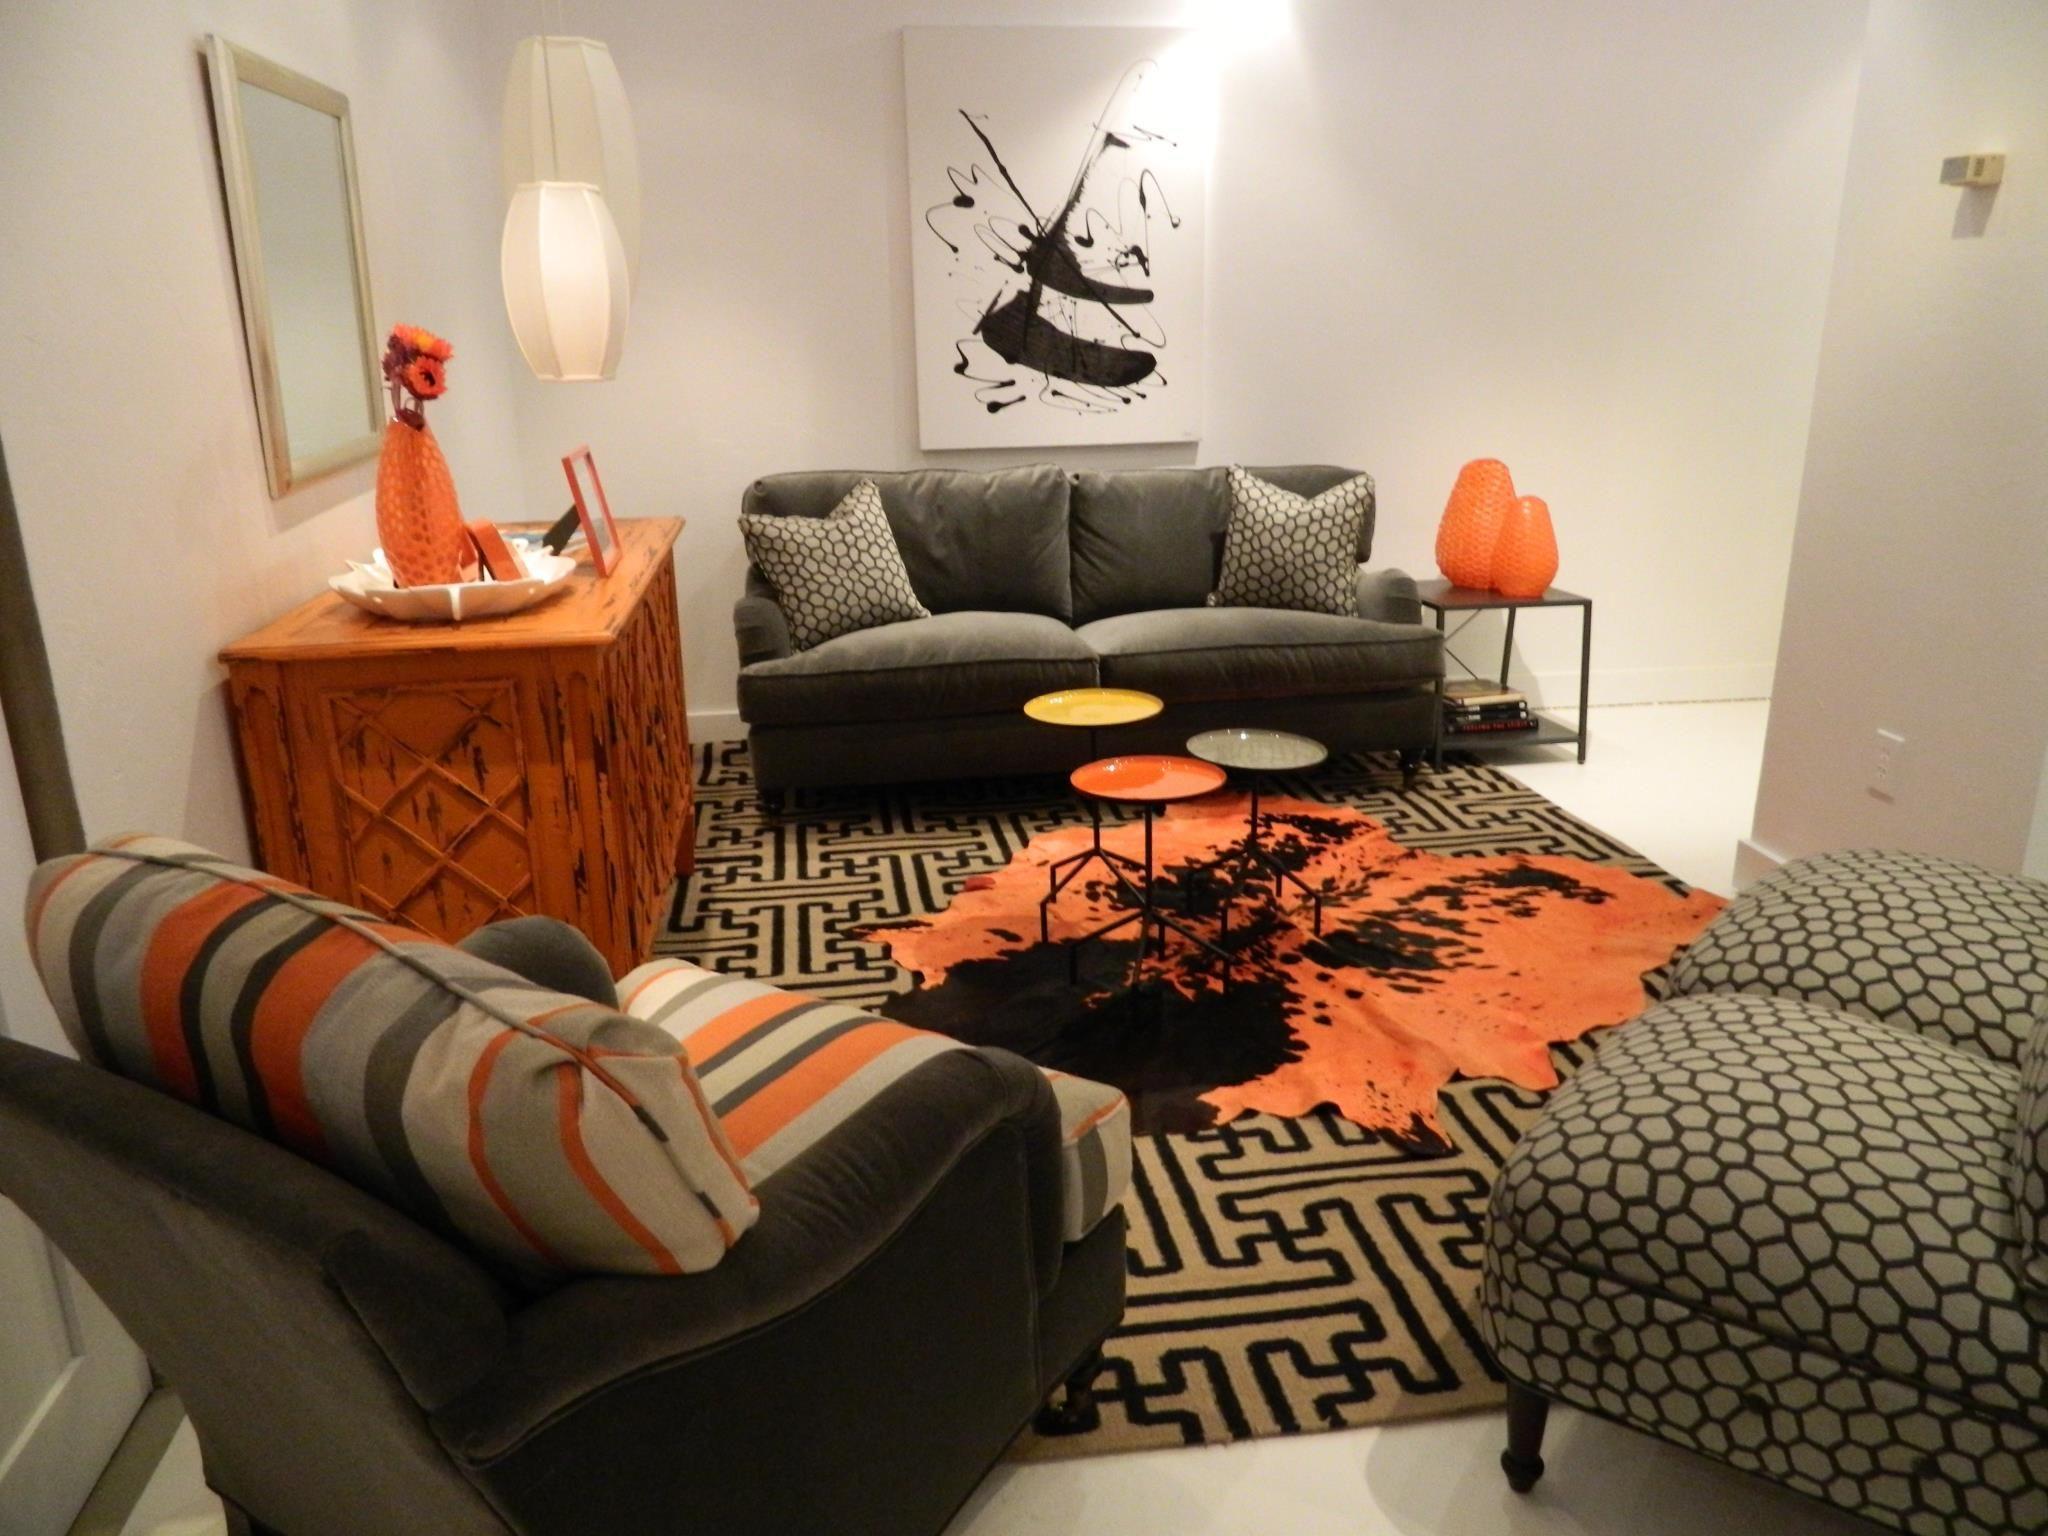 Robin Bruce Furniture Http://www.ubufurniture.com/UBU_site/Home